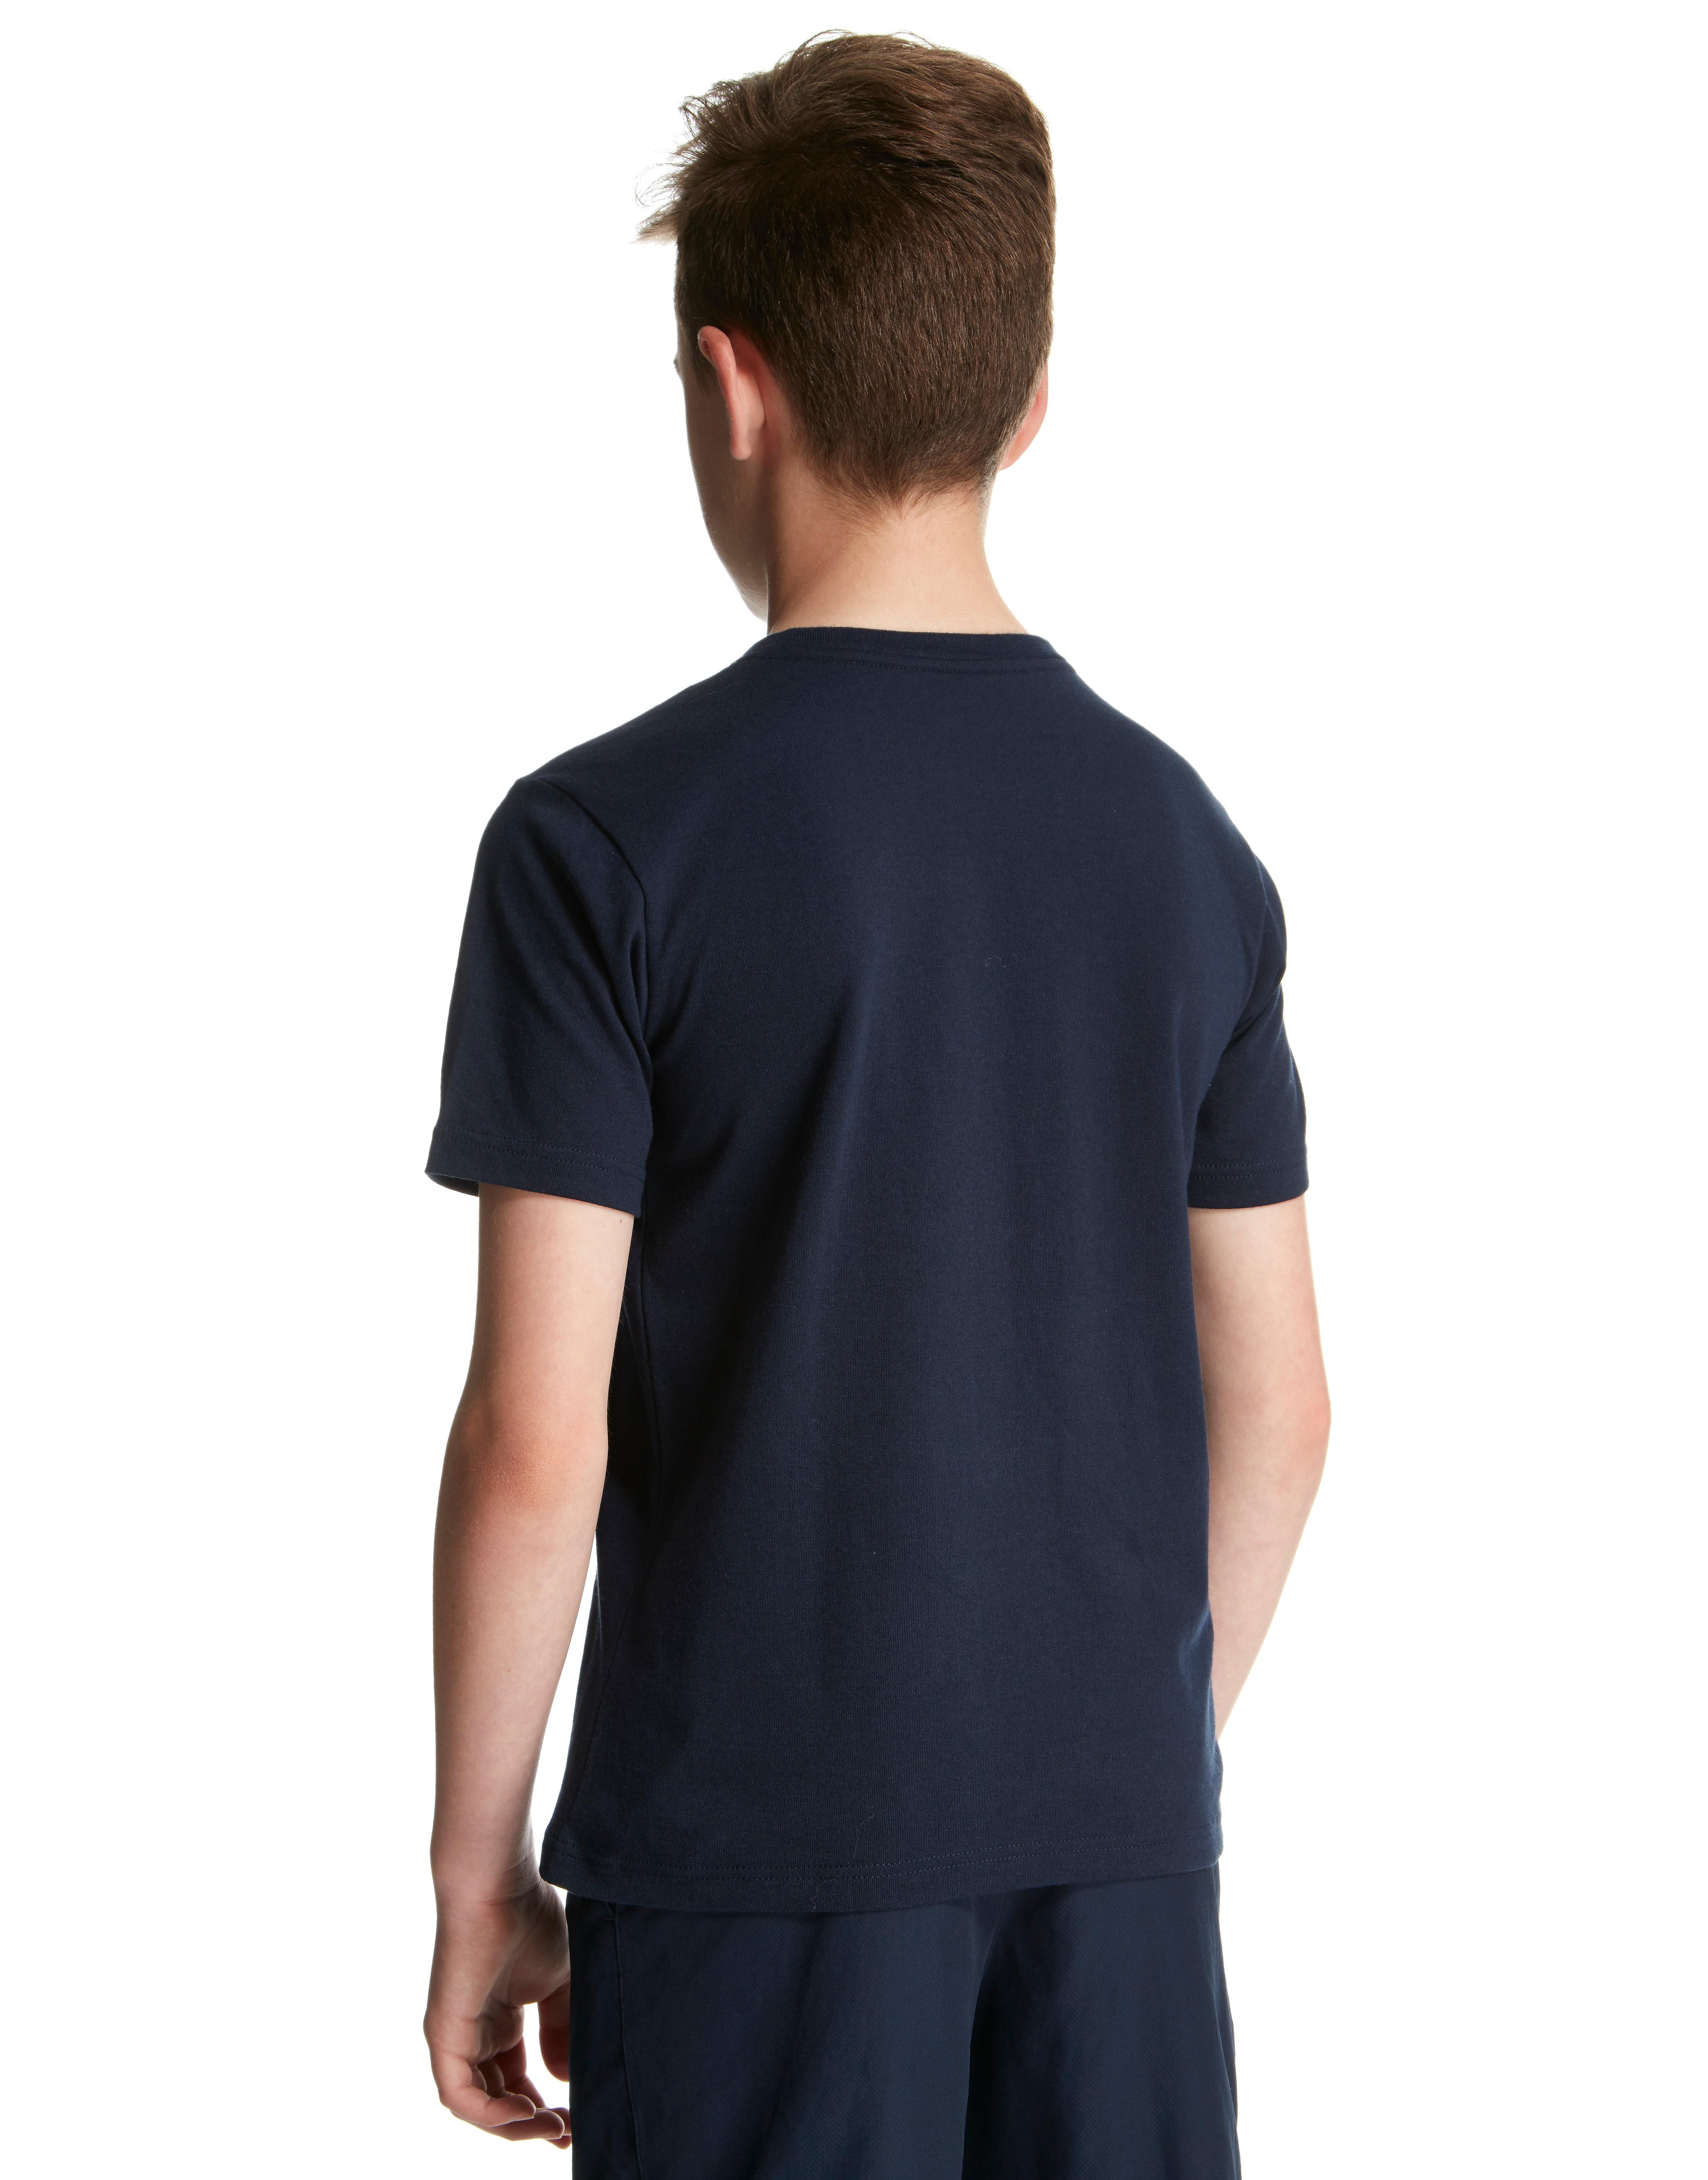 Lacoste Sport T-Shirt Junior